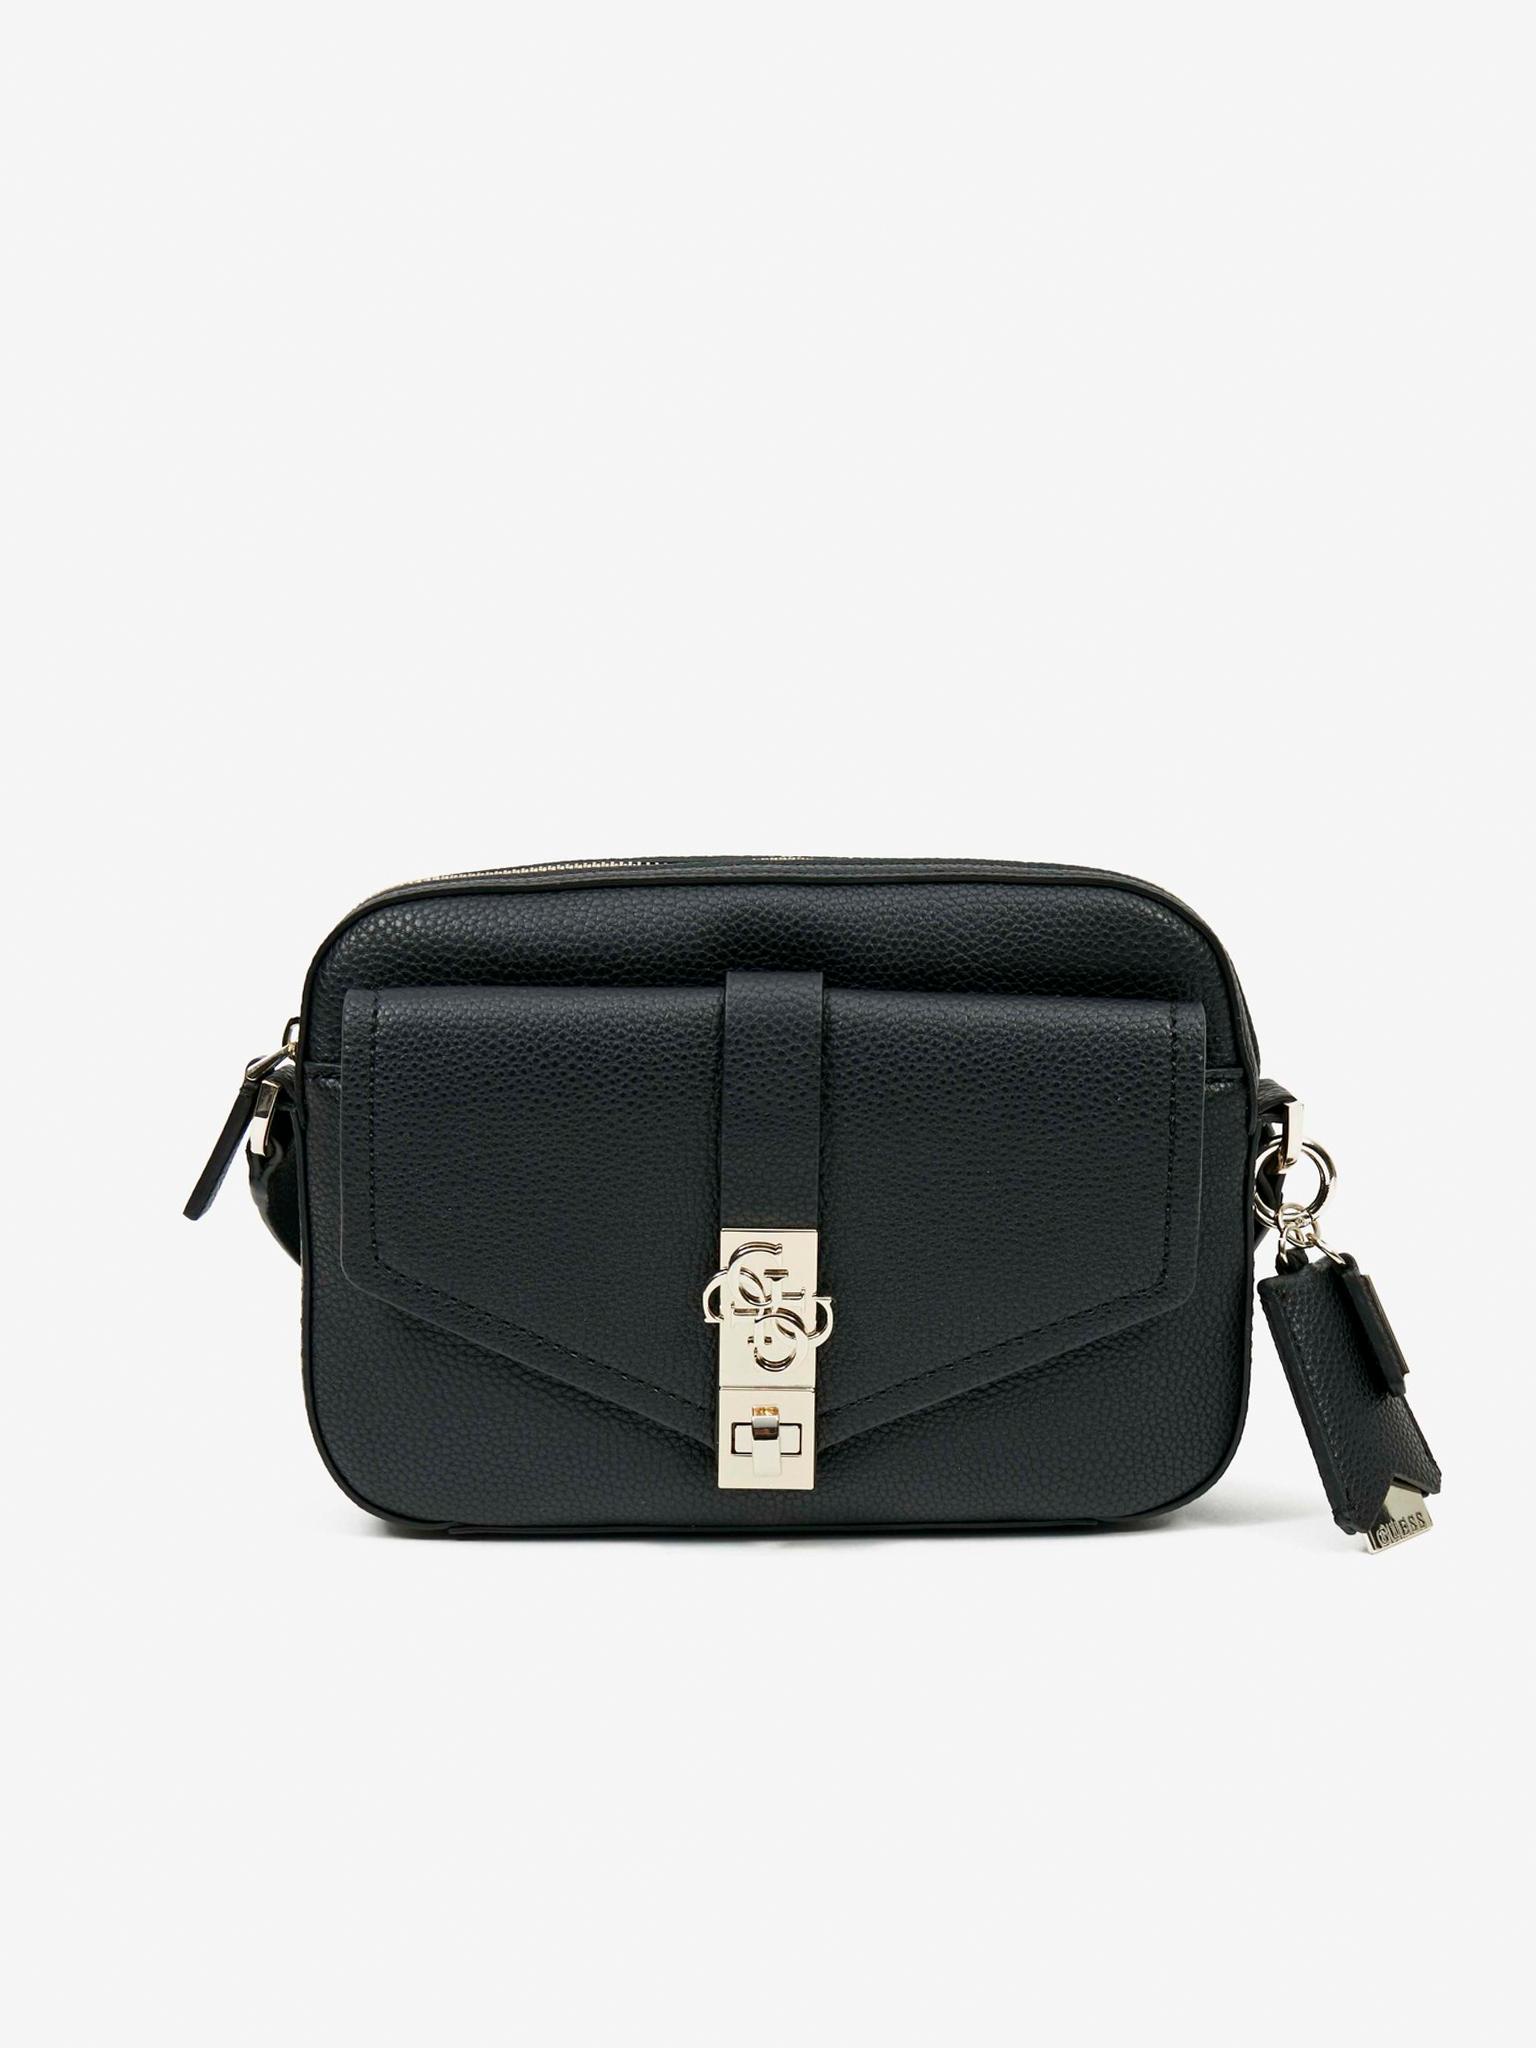 Guess Women's bag black